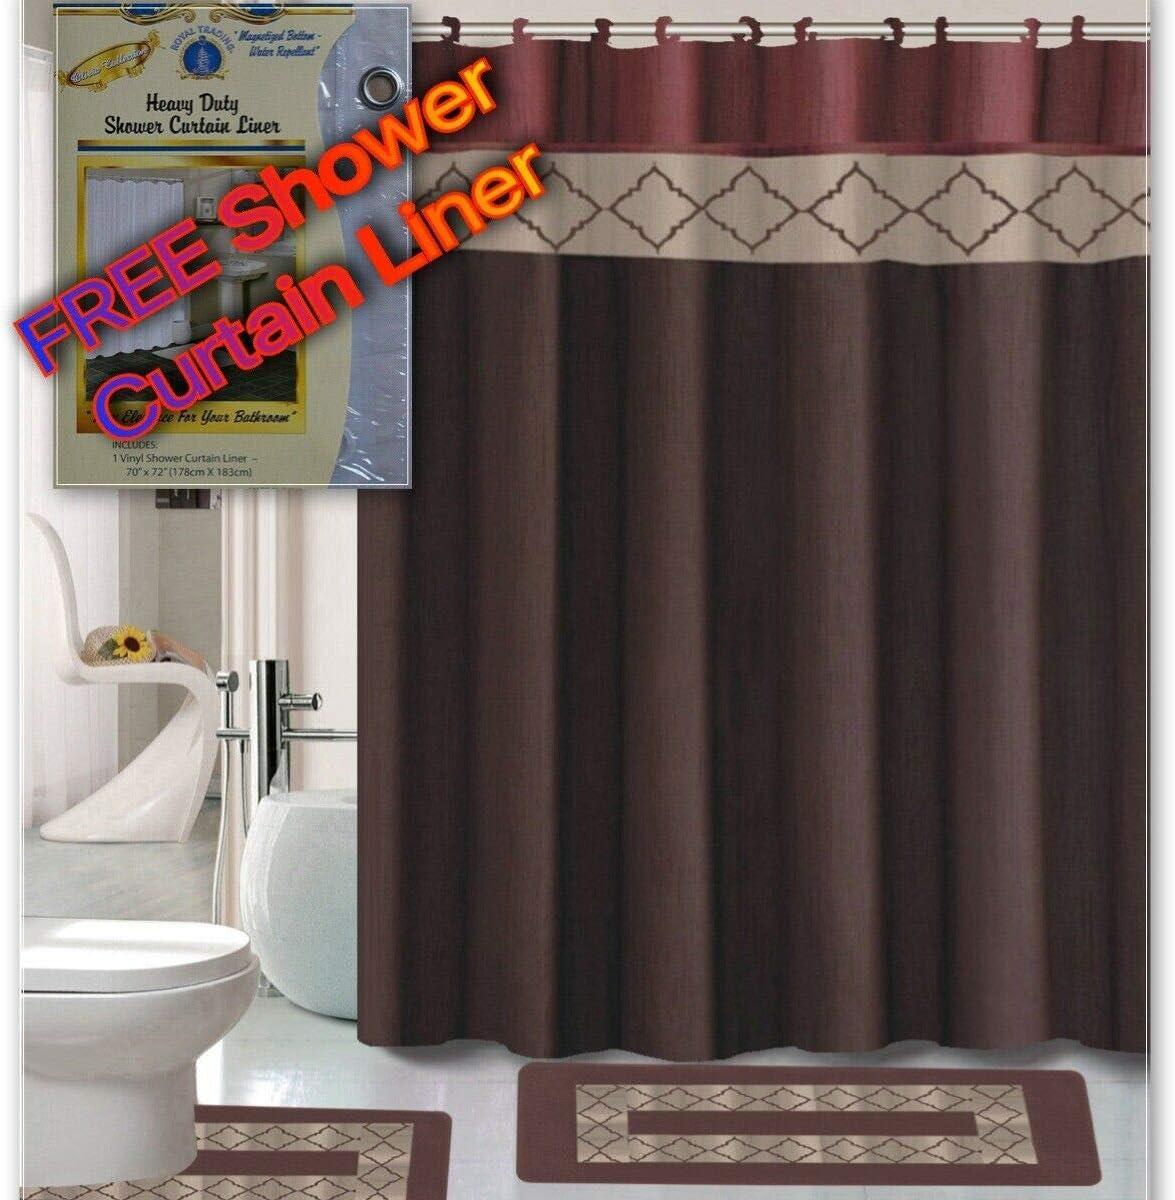 Empire Home 15 Piece Elegant Bathroom Set Bath Rugs Shower Curtain Hooks + Free Shower Liner!!! (Dynasty Burgundy)